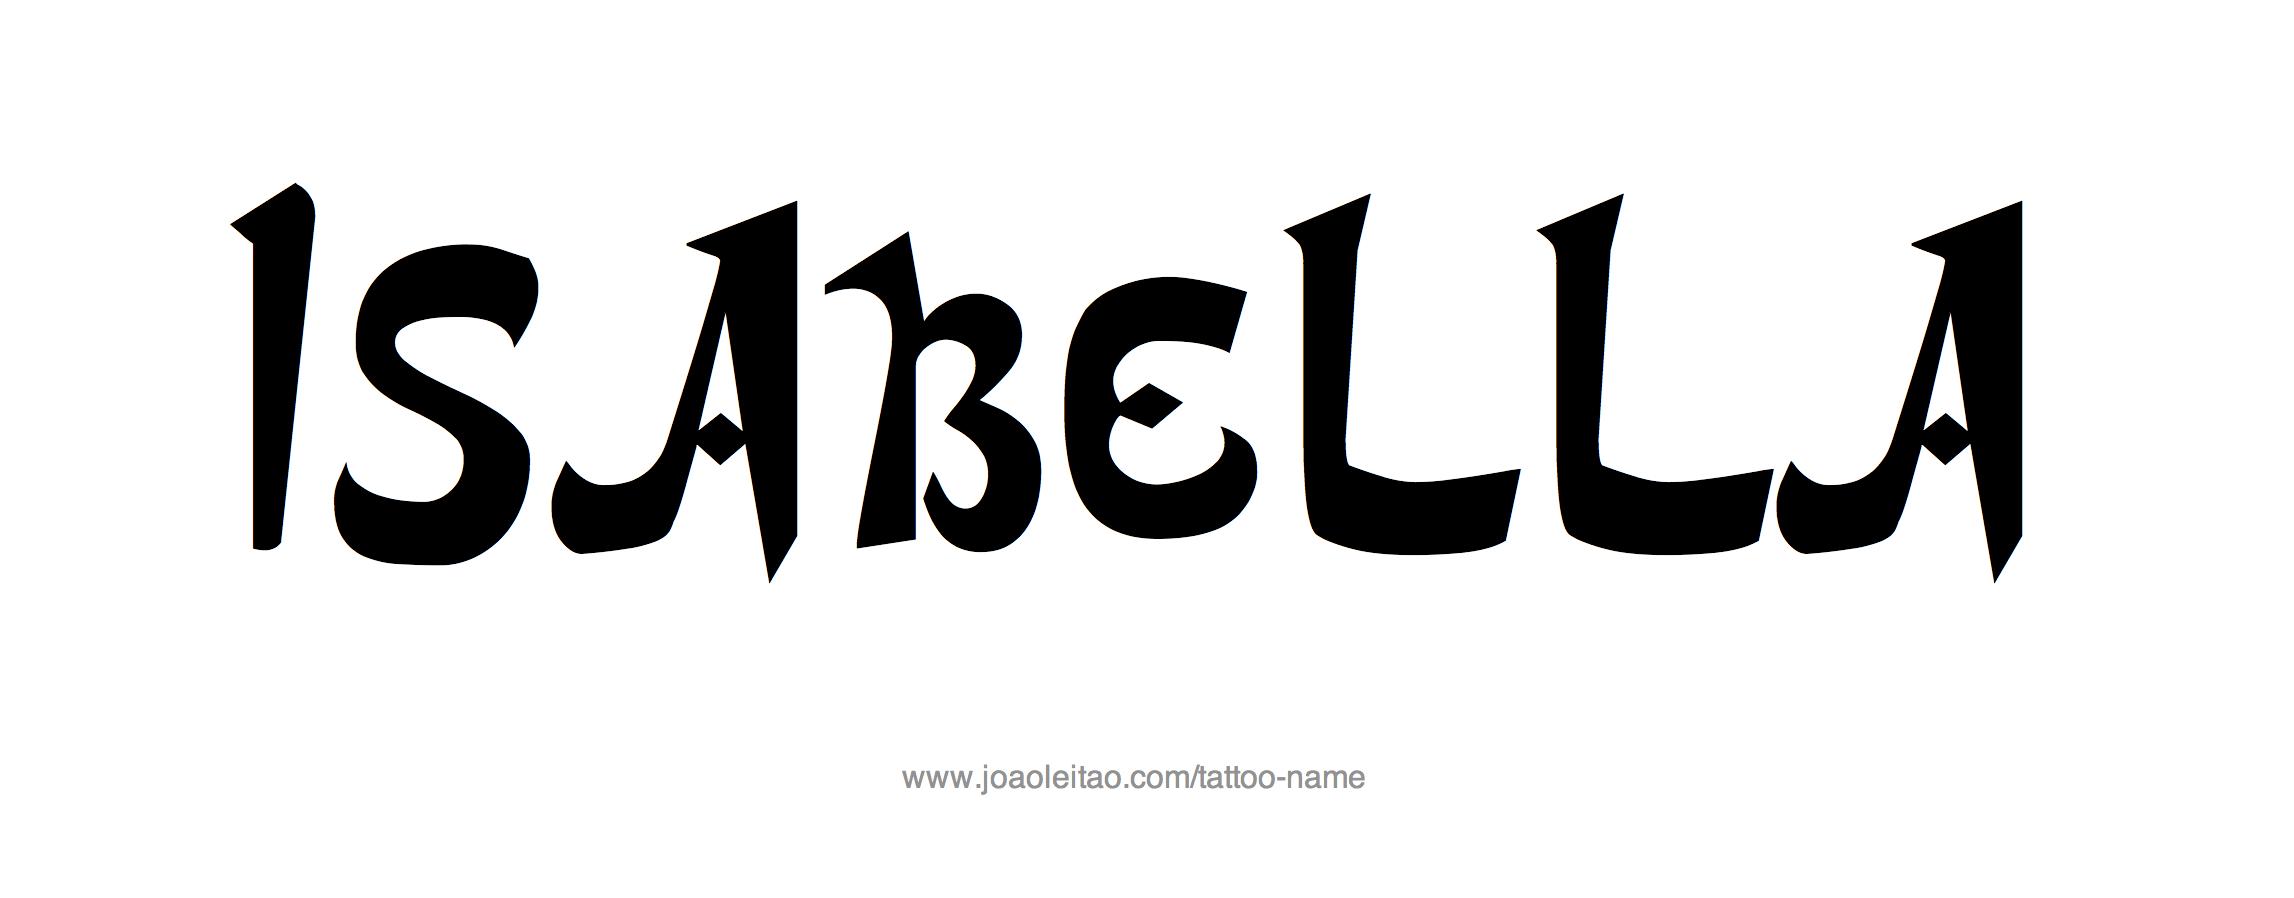 Isabella Name Tattoo Designs